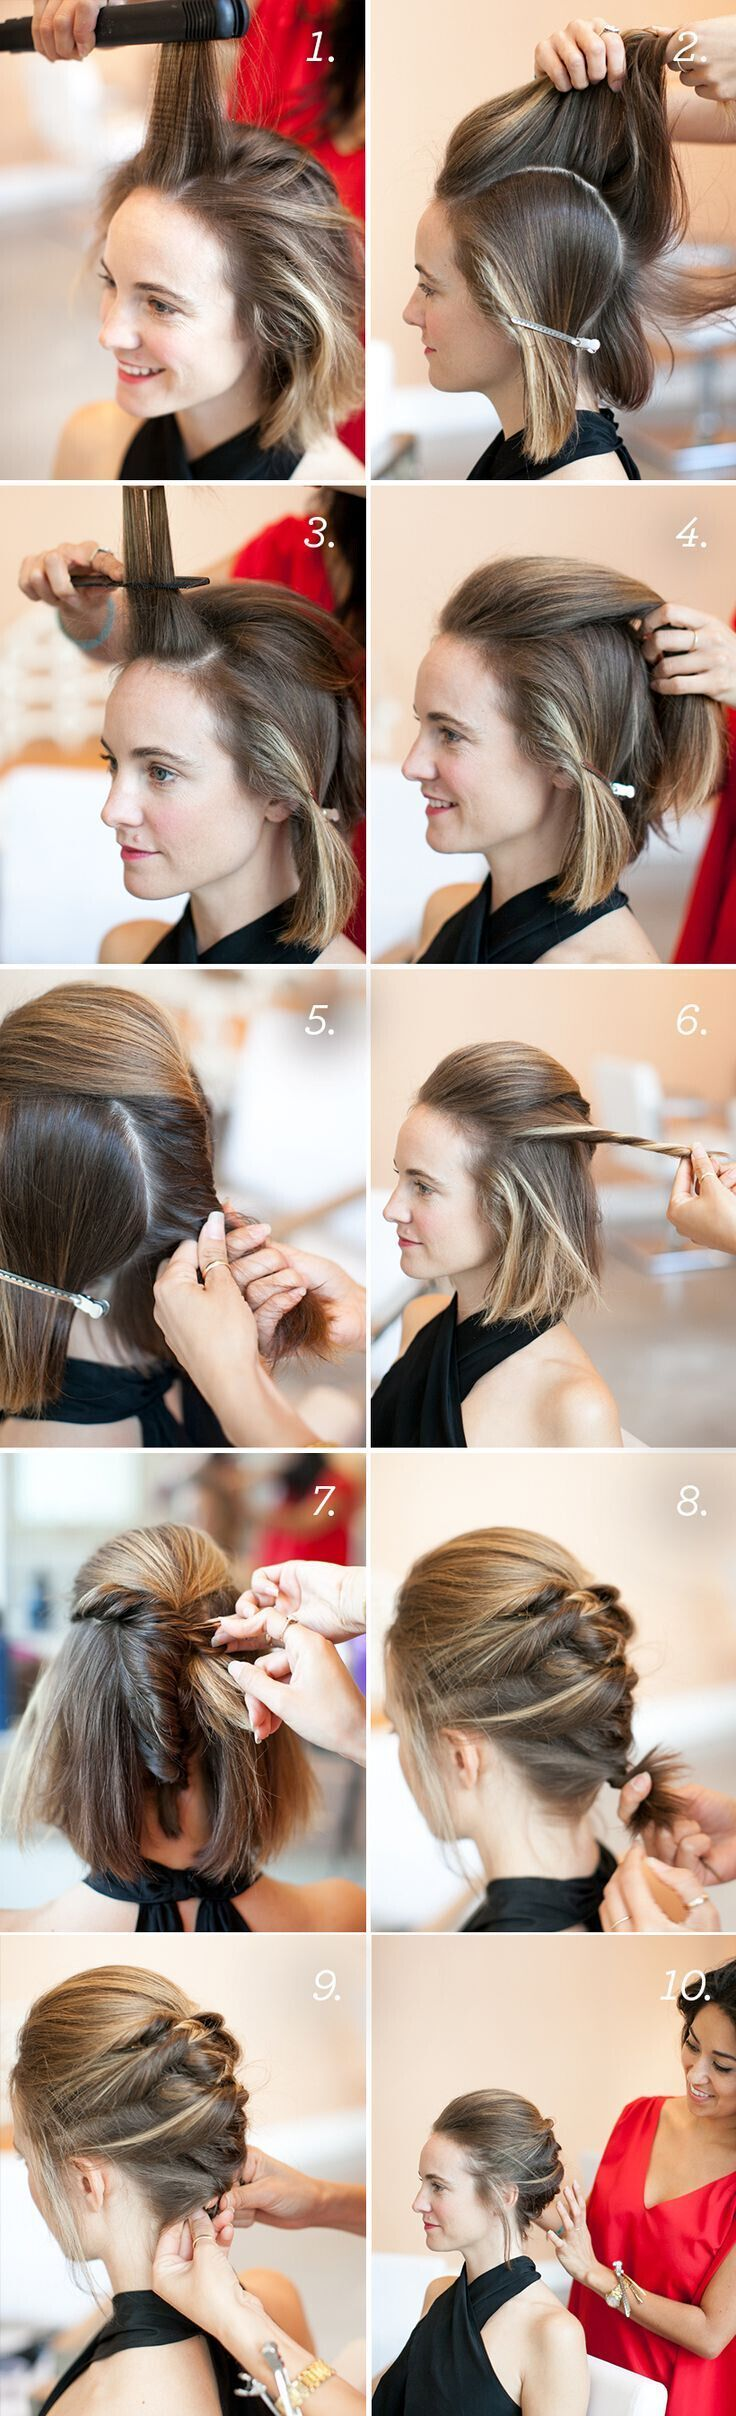 Short Cut Hairstyles 22